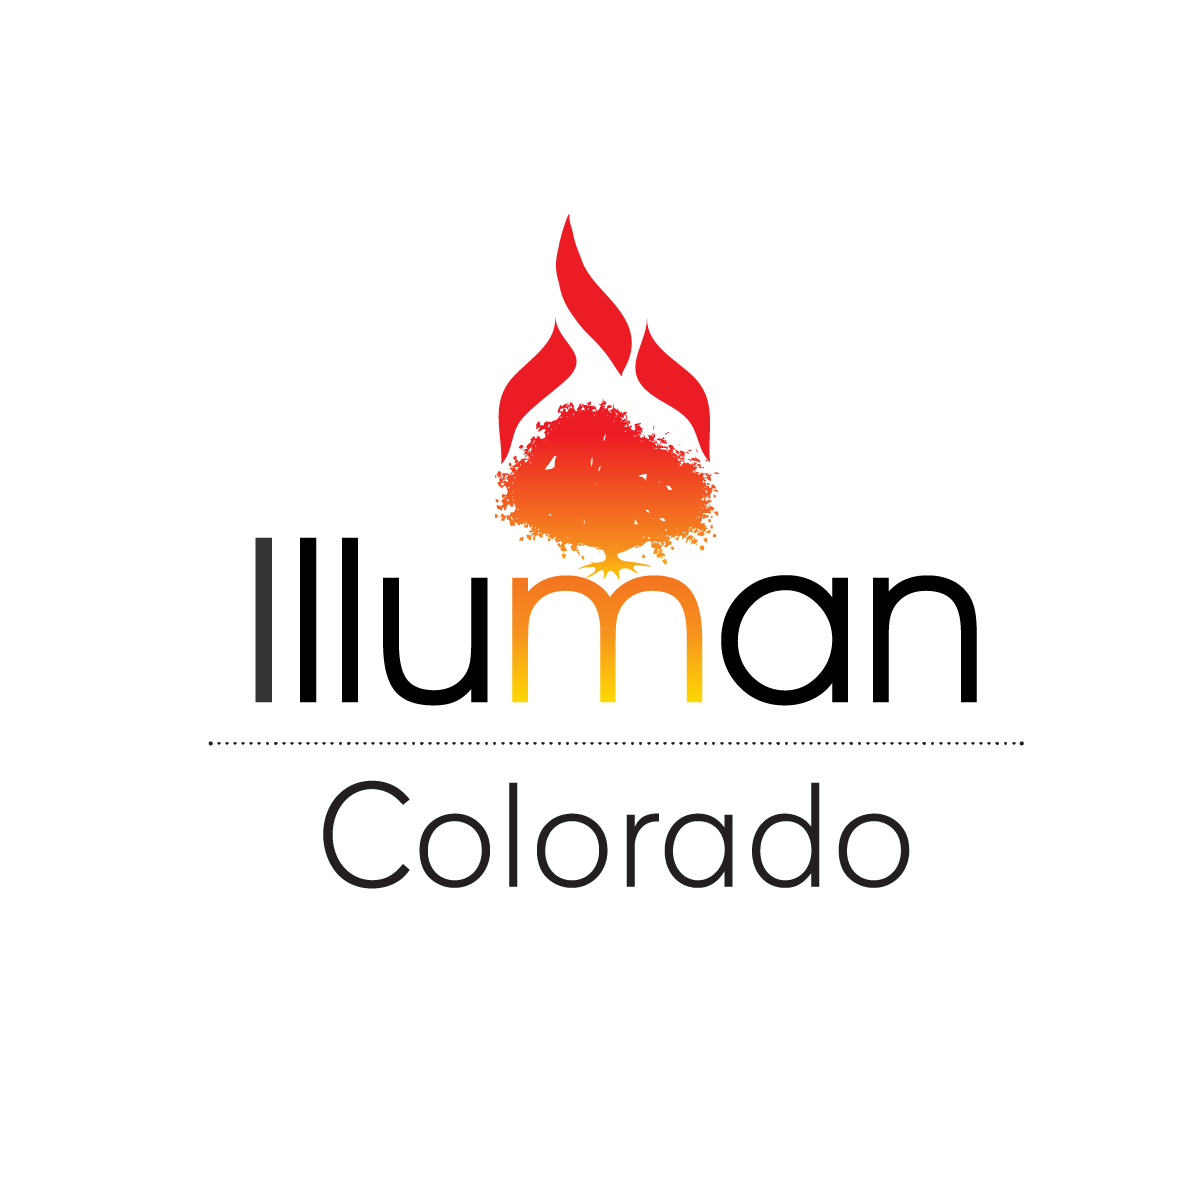 Illuman of Colorado